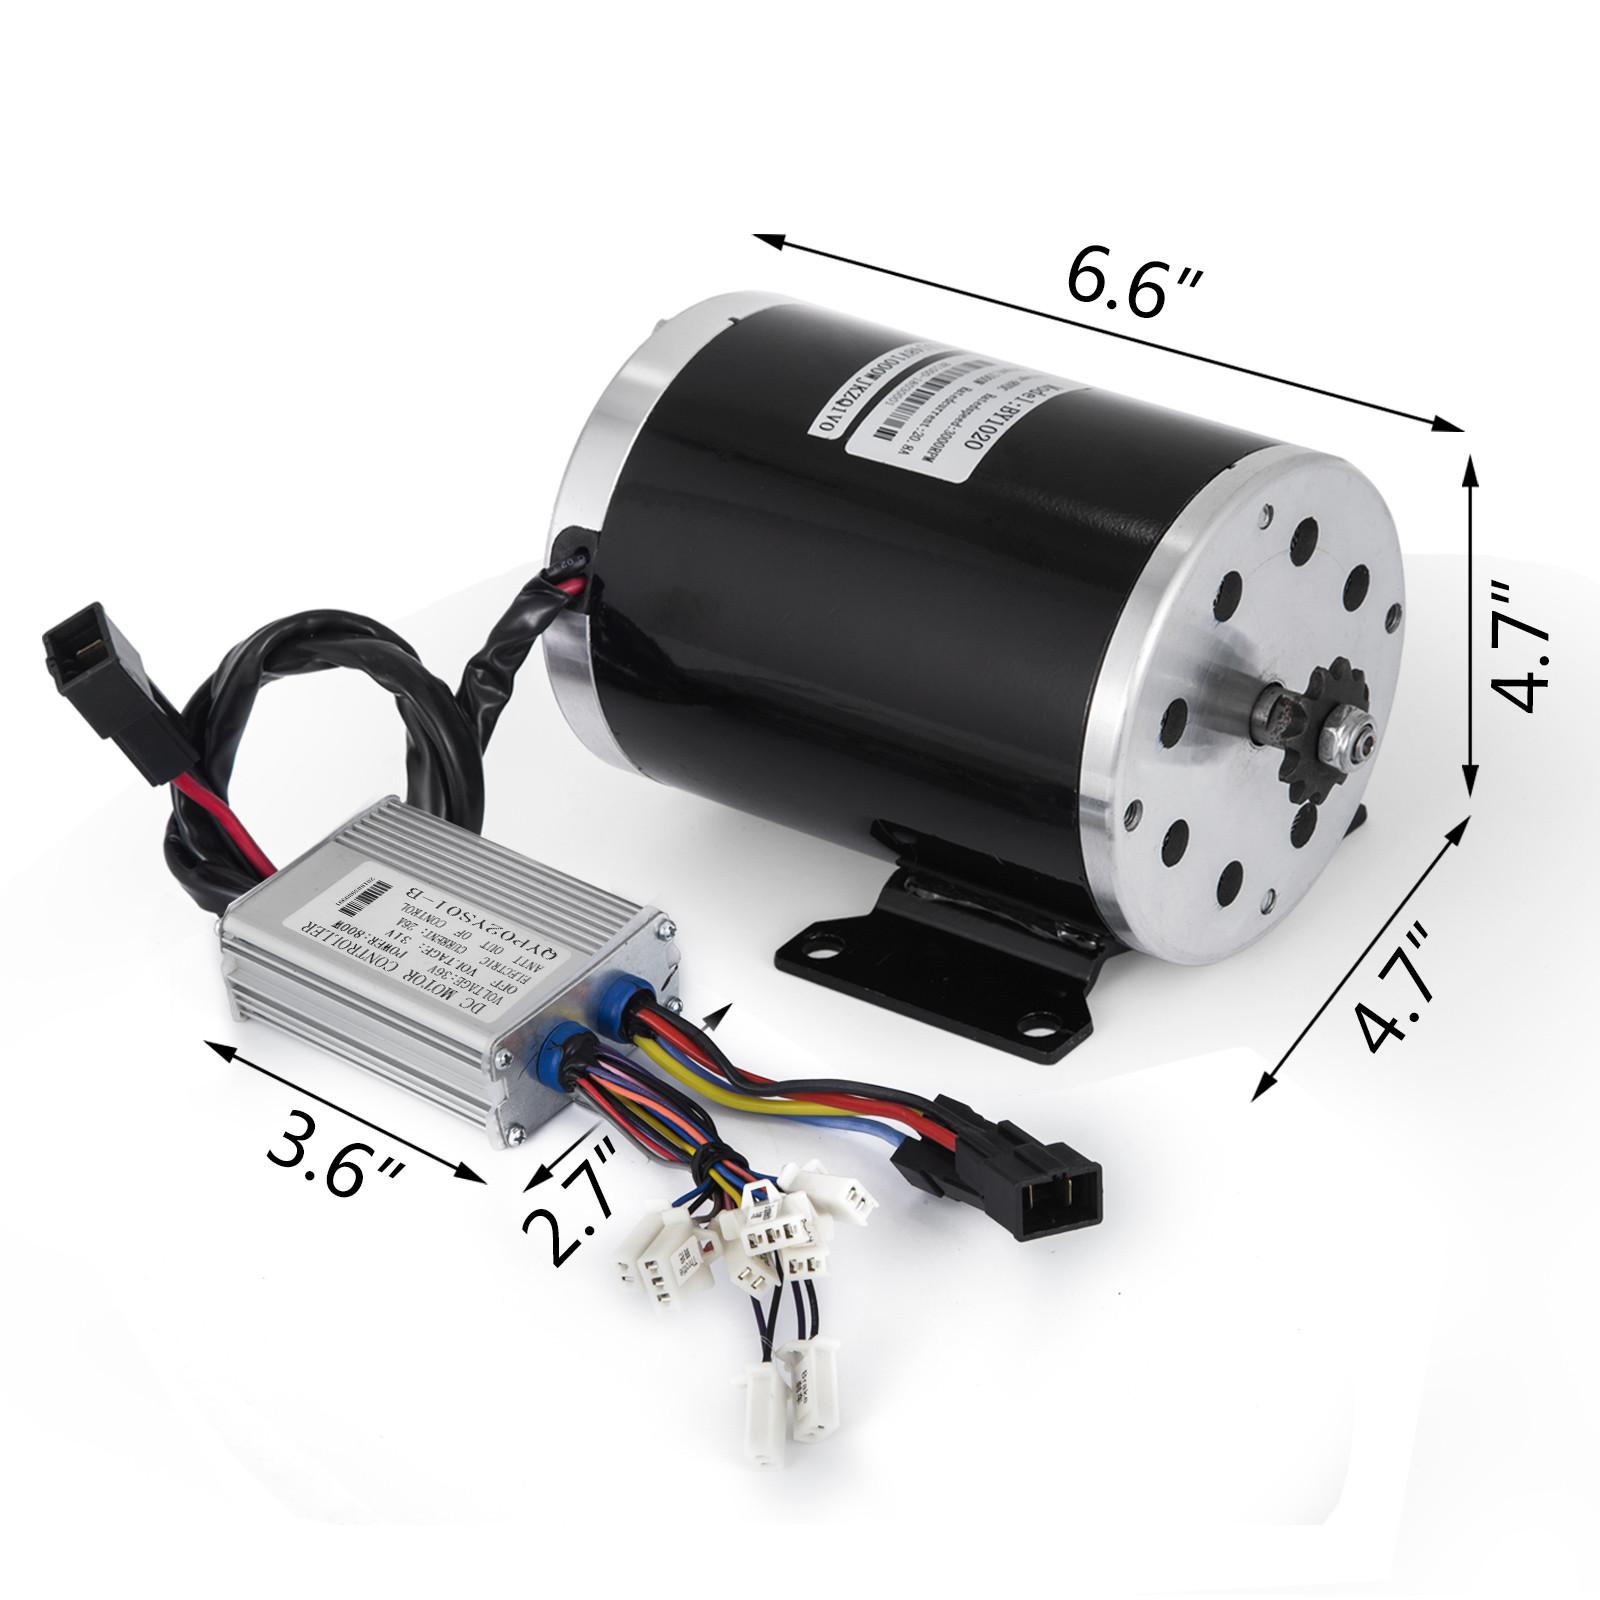 36v-Electric-Motor-controller-throttle-kit-f-Scooter-E-Scooter-ATV-Permanent thumbnail 86